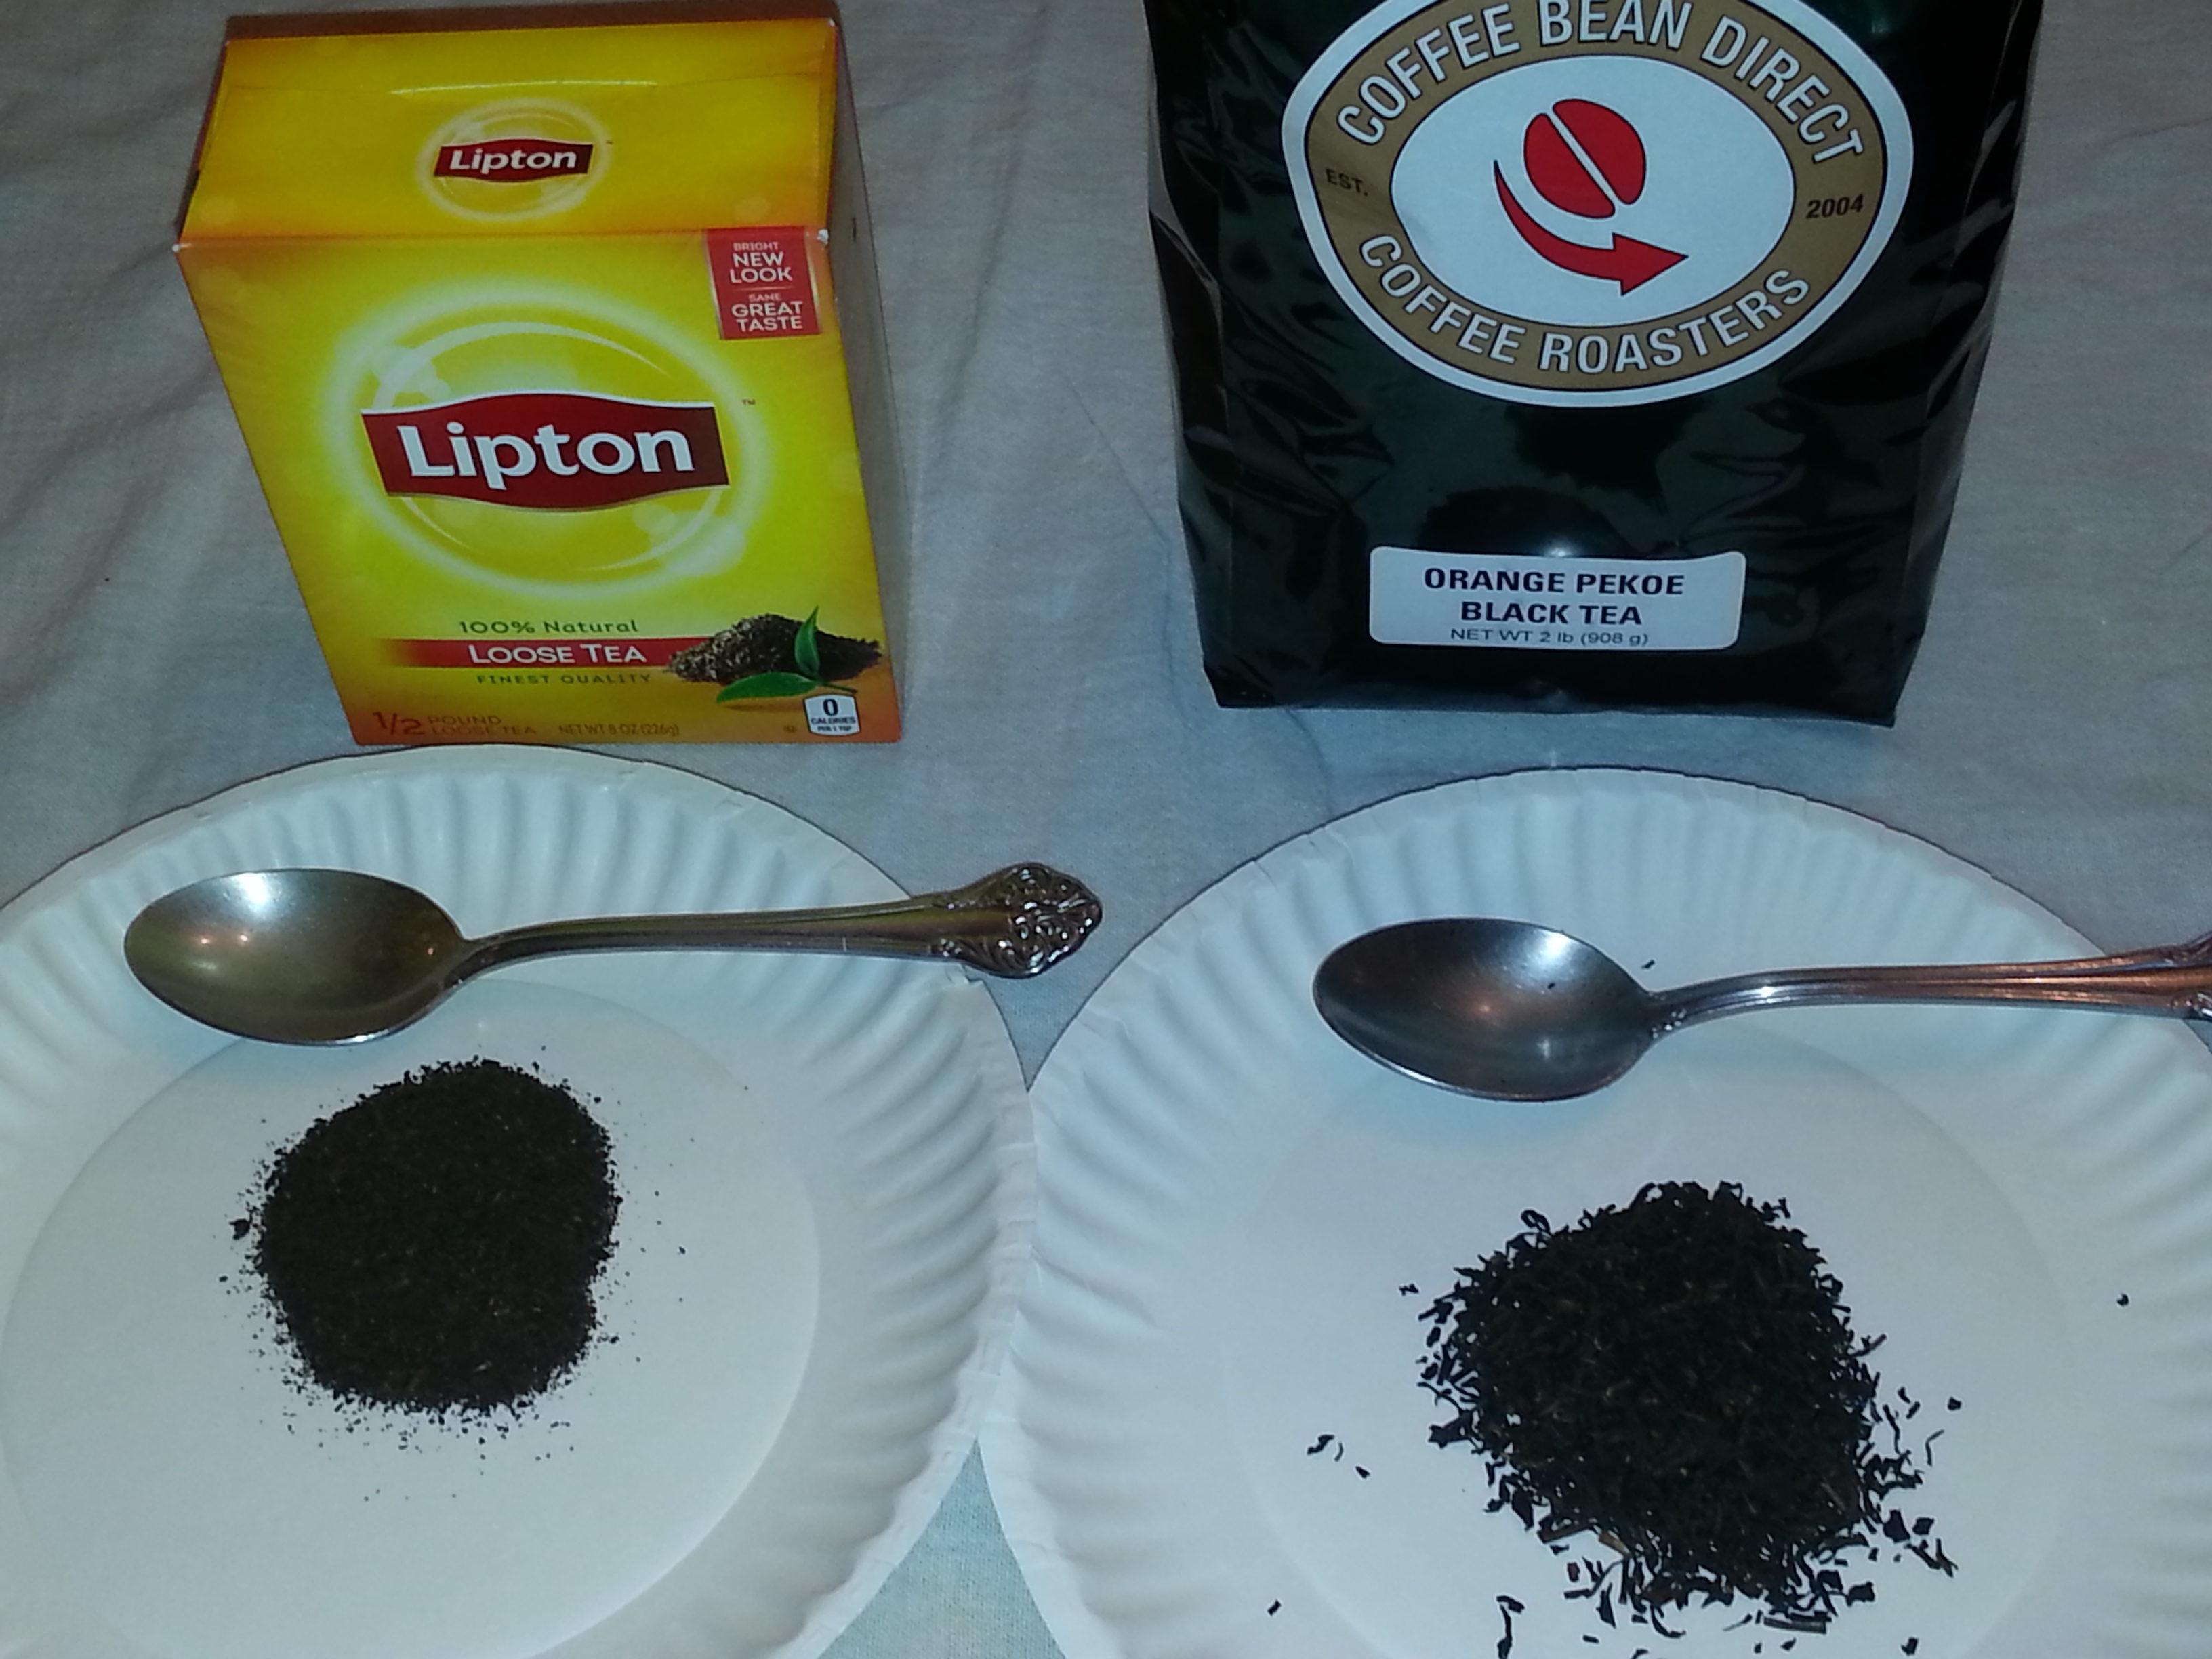 Top 190 Complaints And Reviews About Lipton Tea